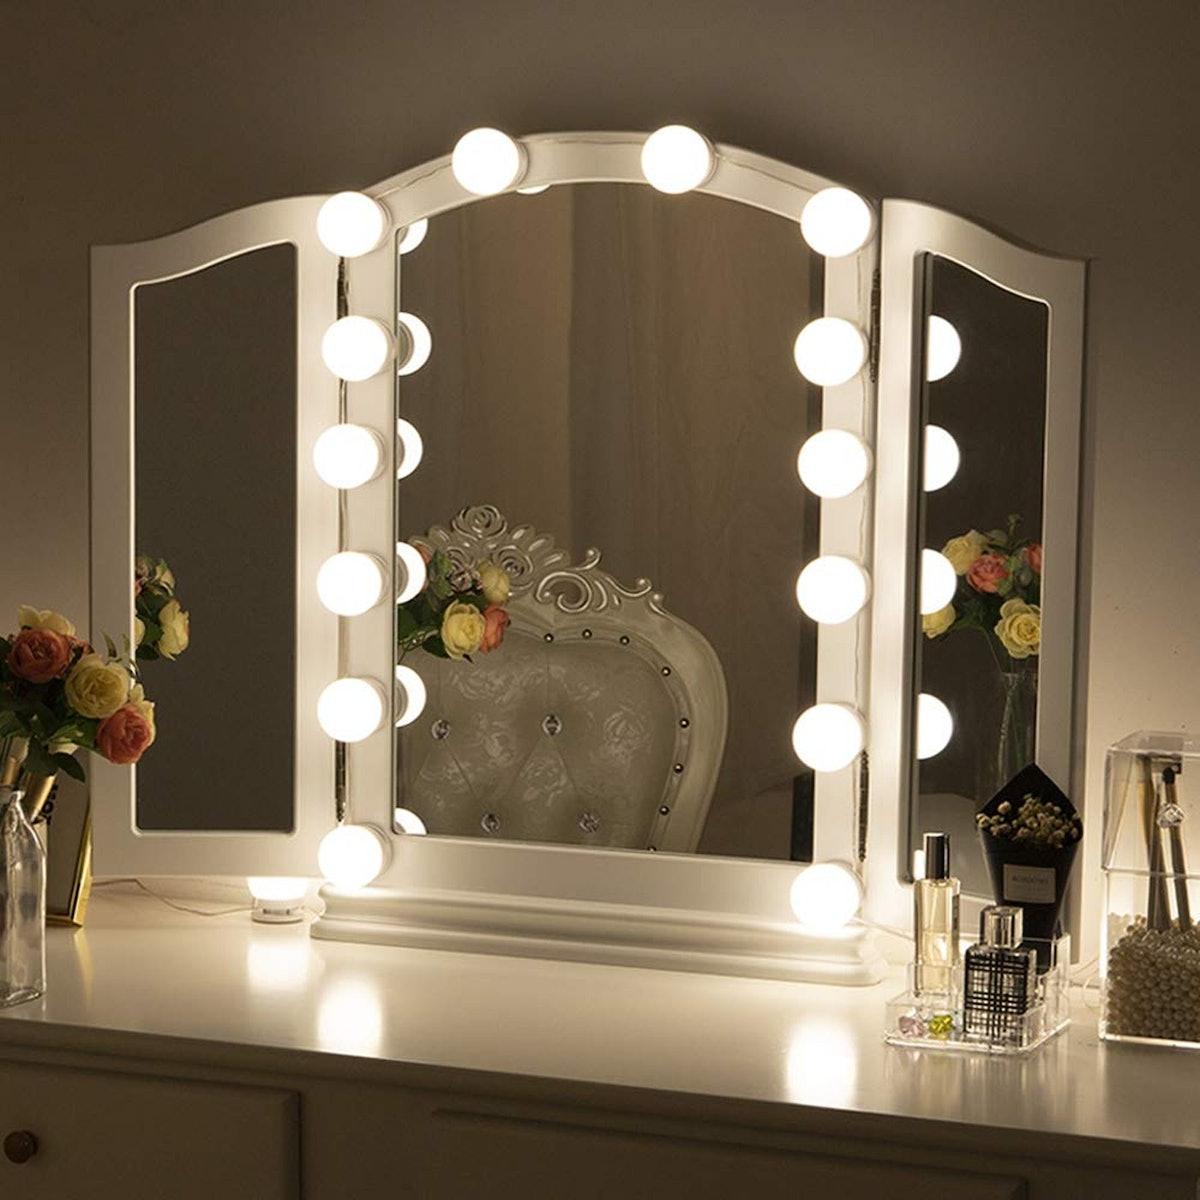 Chende Vanity Lights Kit